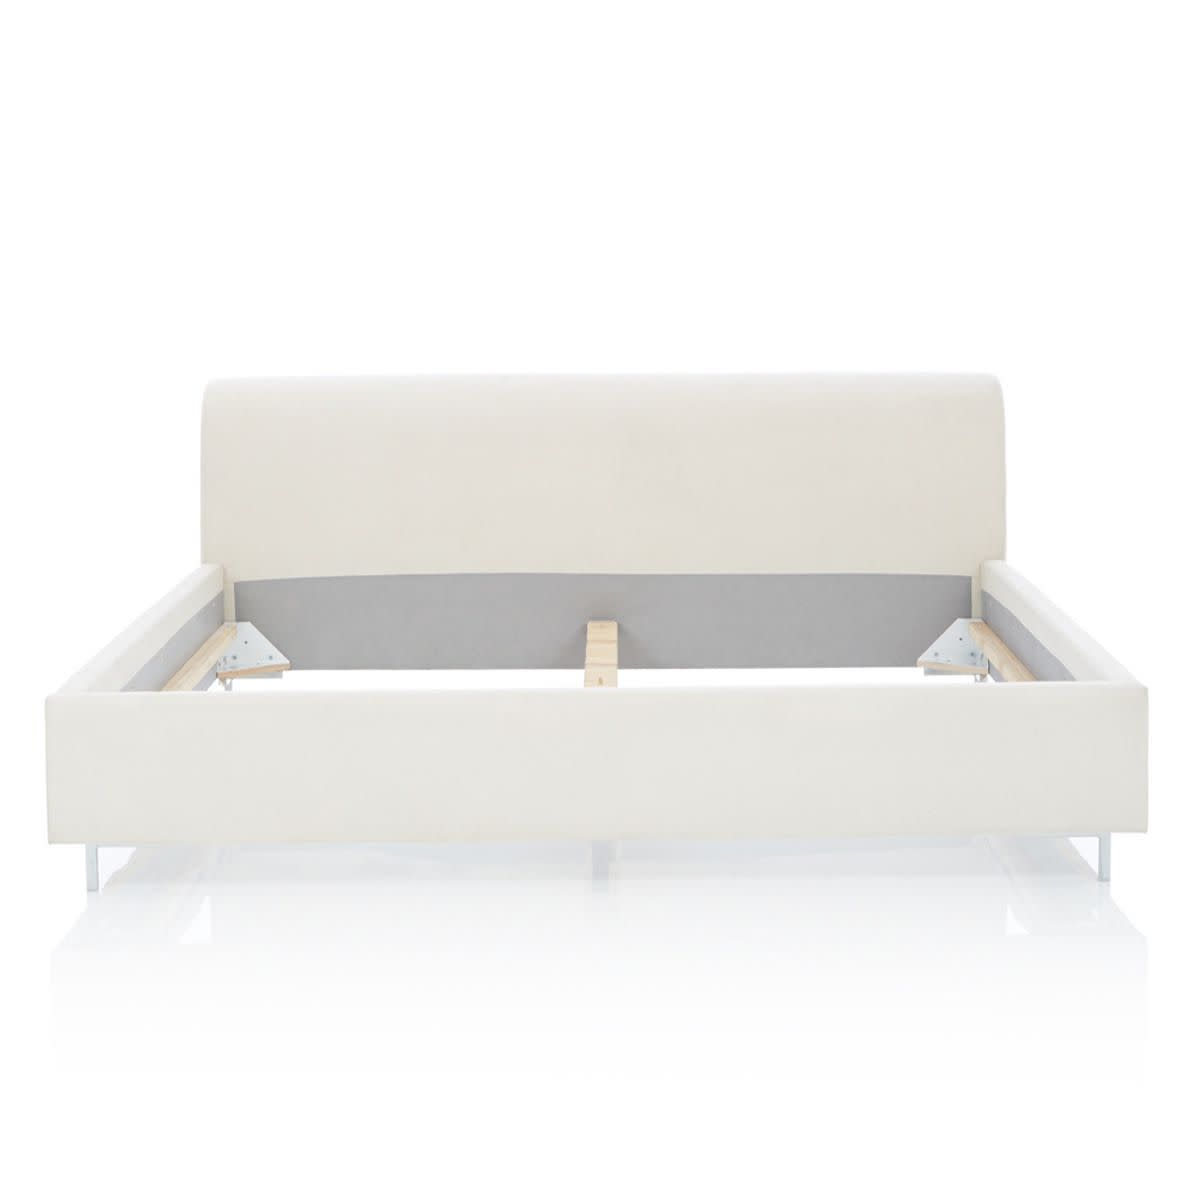 boxspringbett ohne metall neuesten design. Black Bedroom Furniture Sets. Home Design Ideas